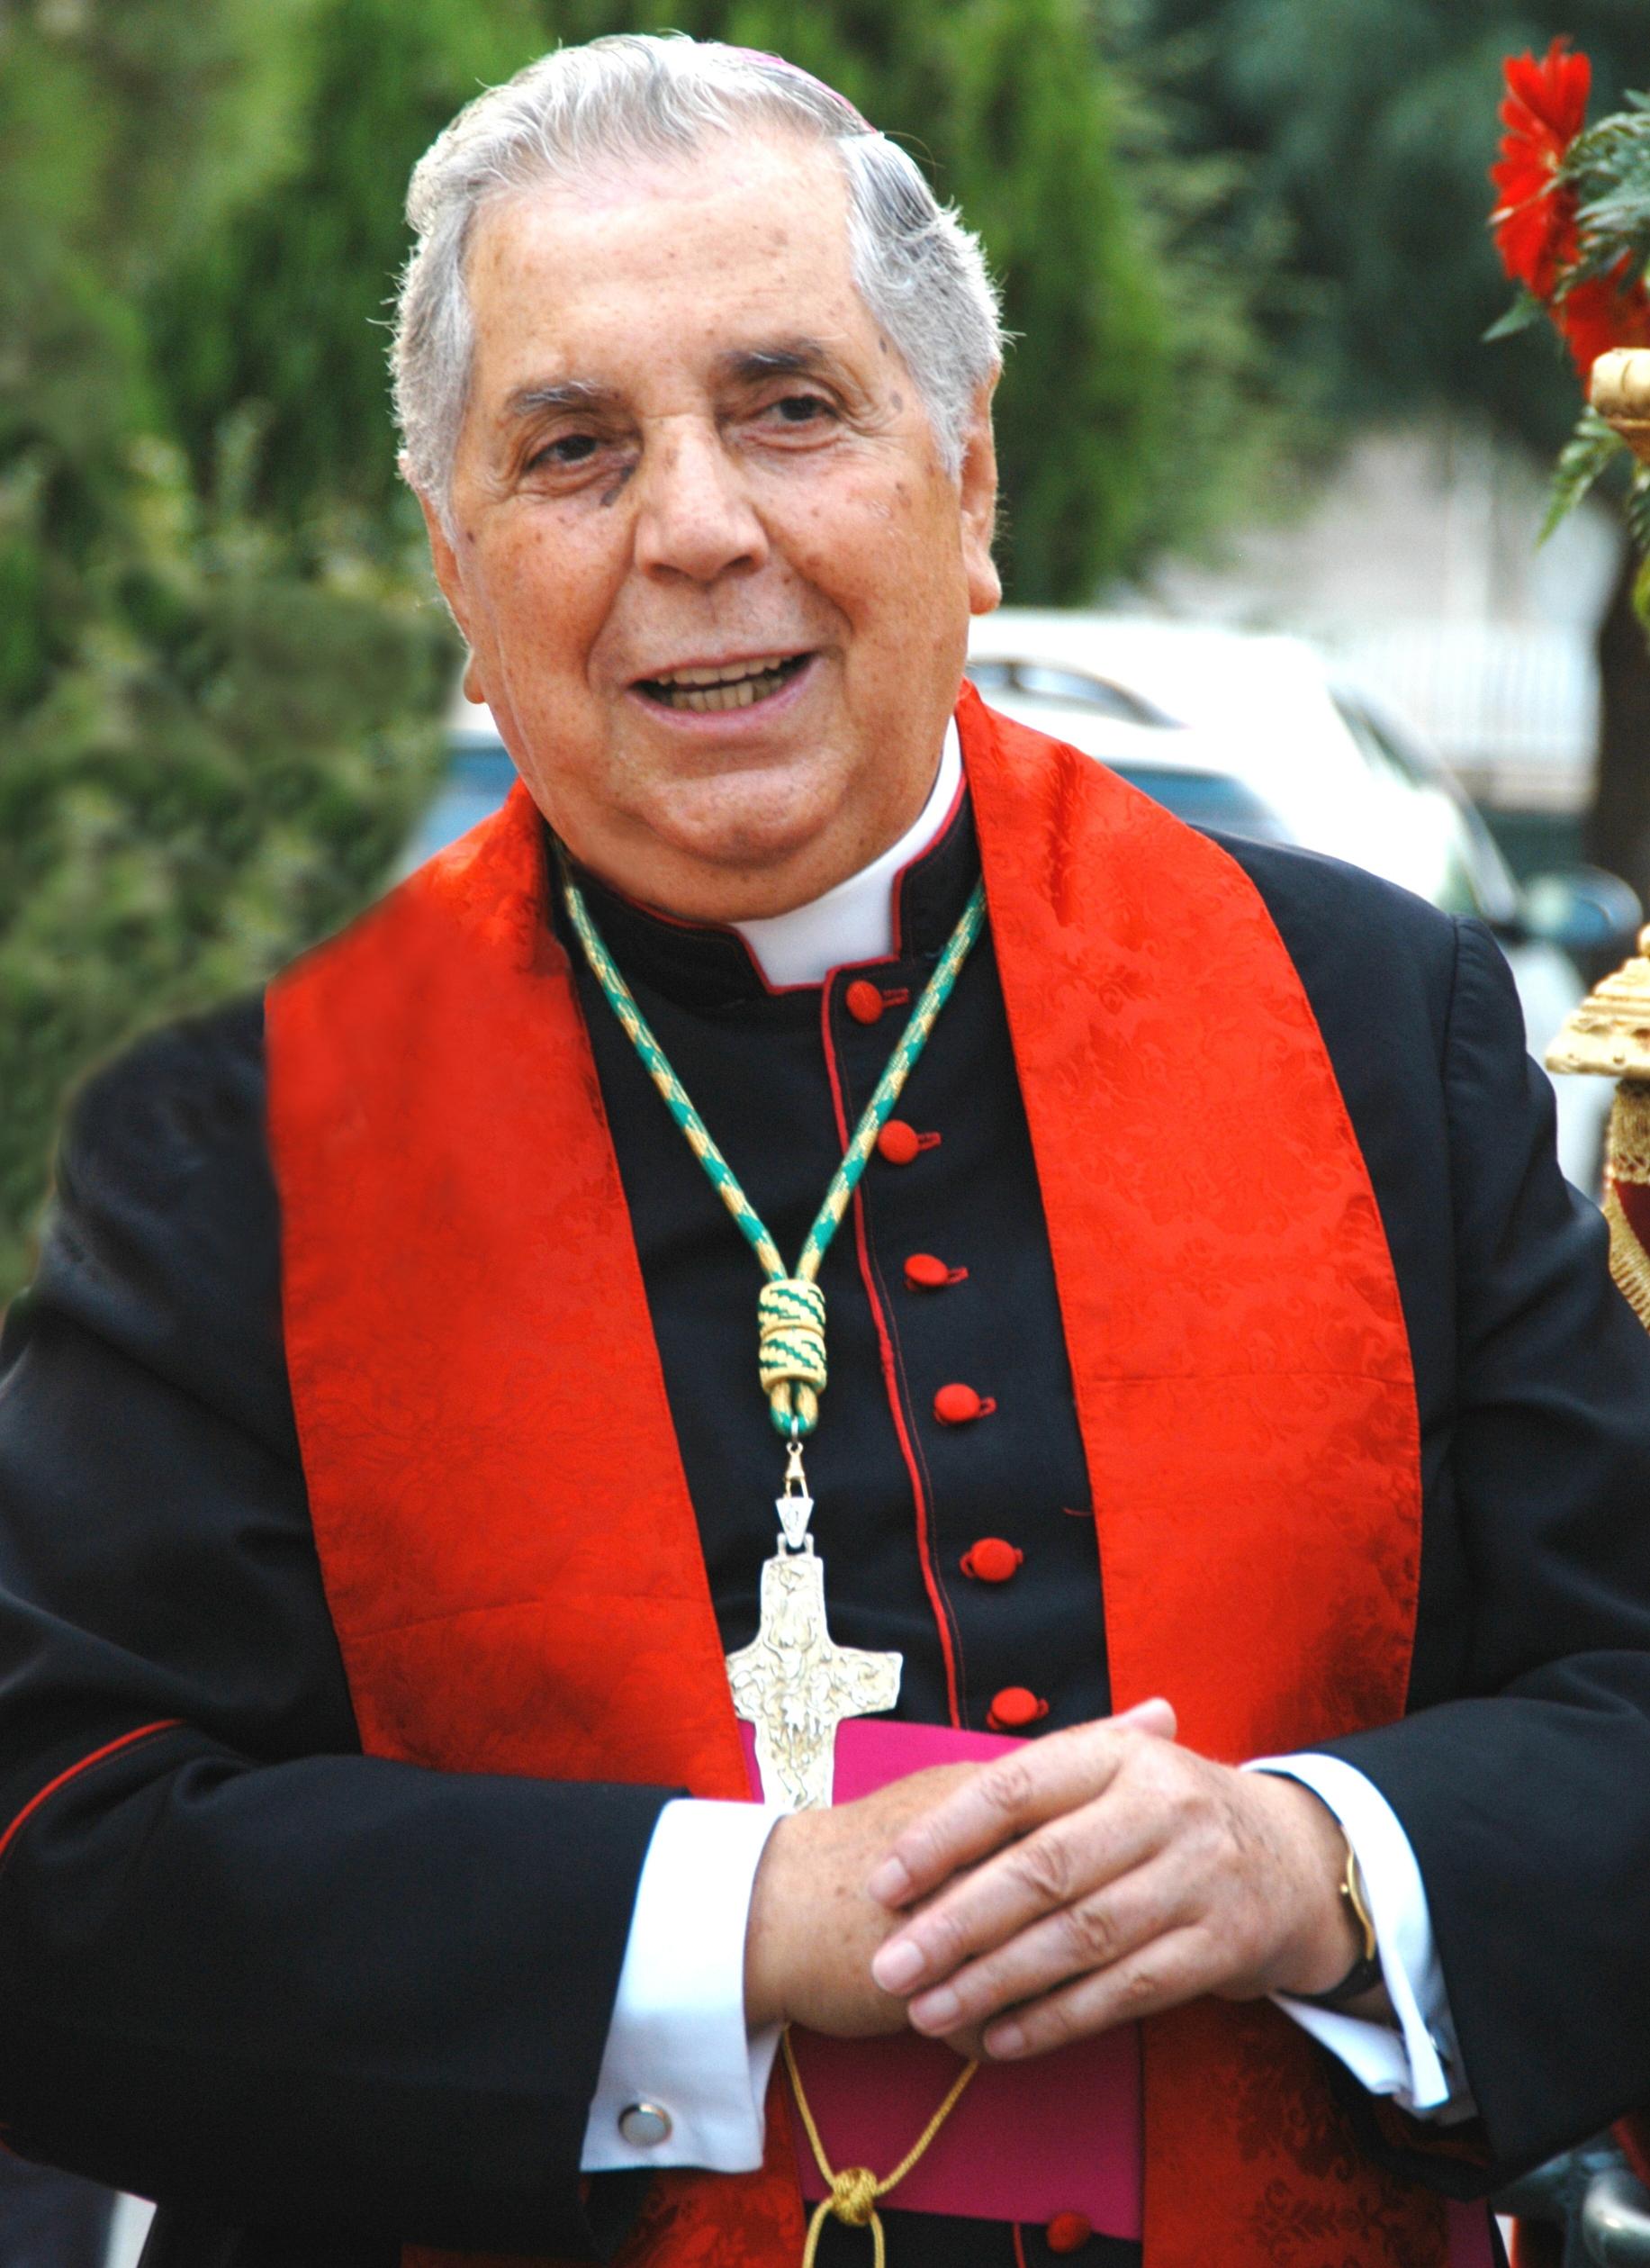 Luigi Bommarito